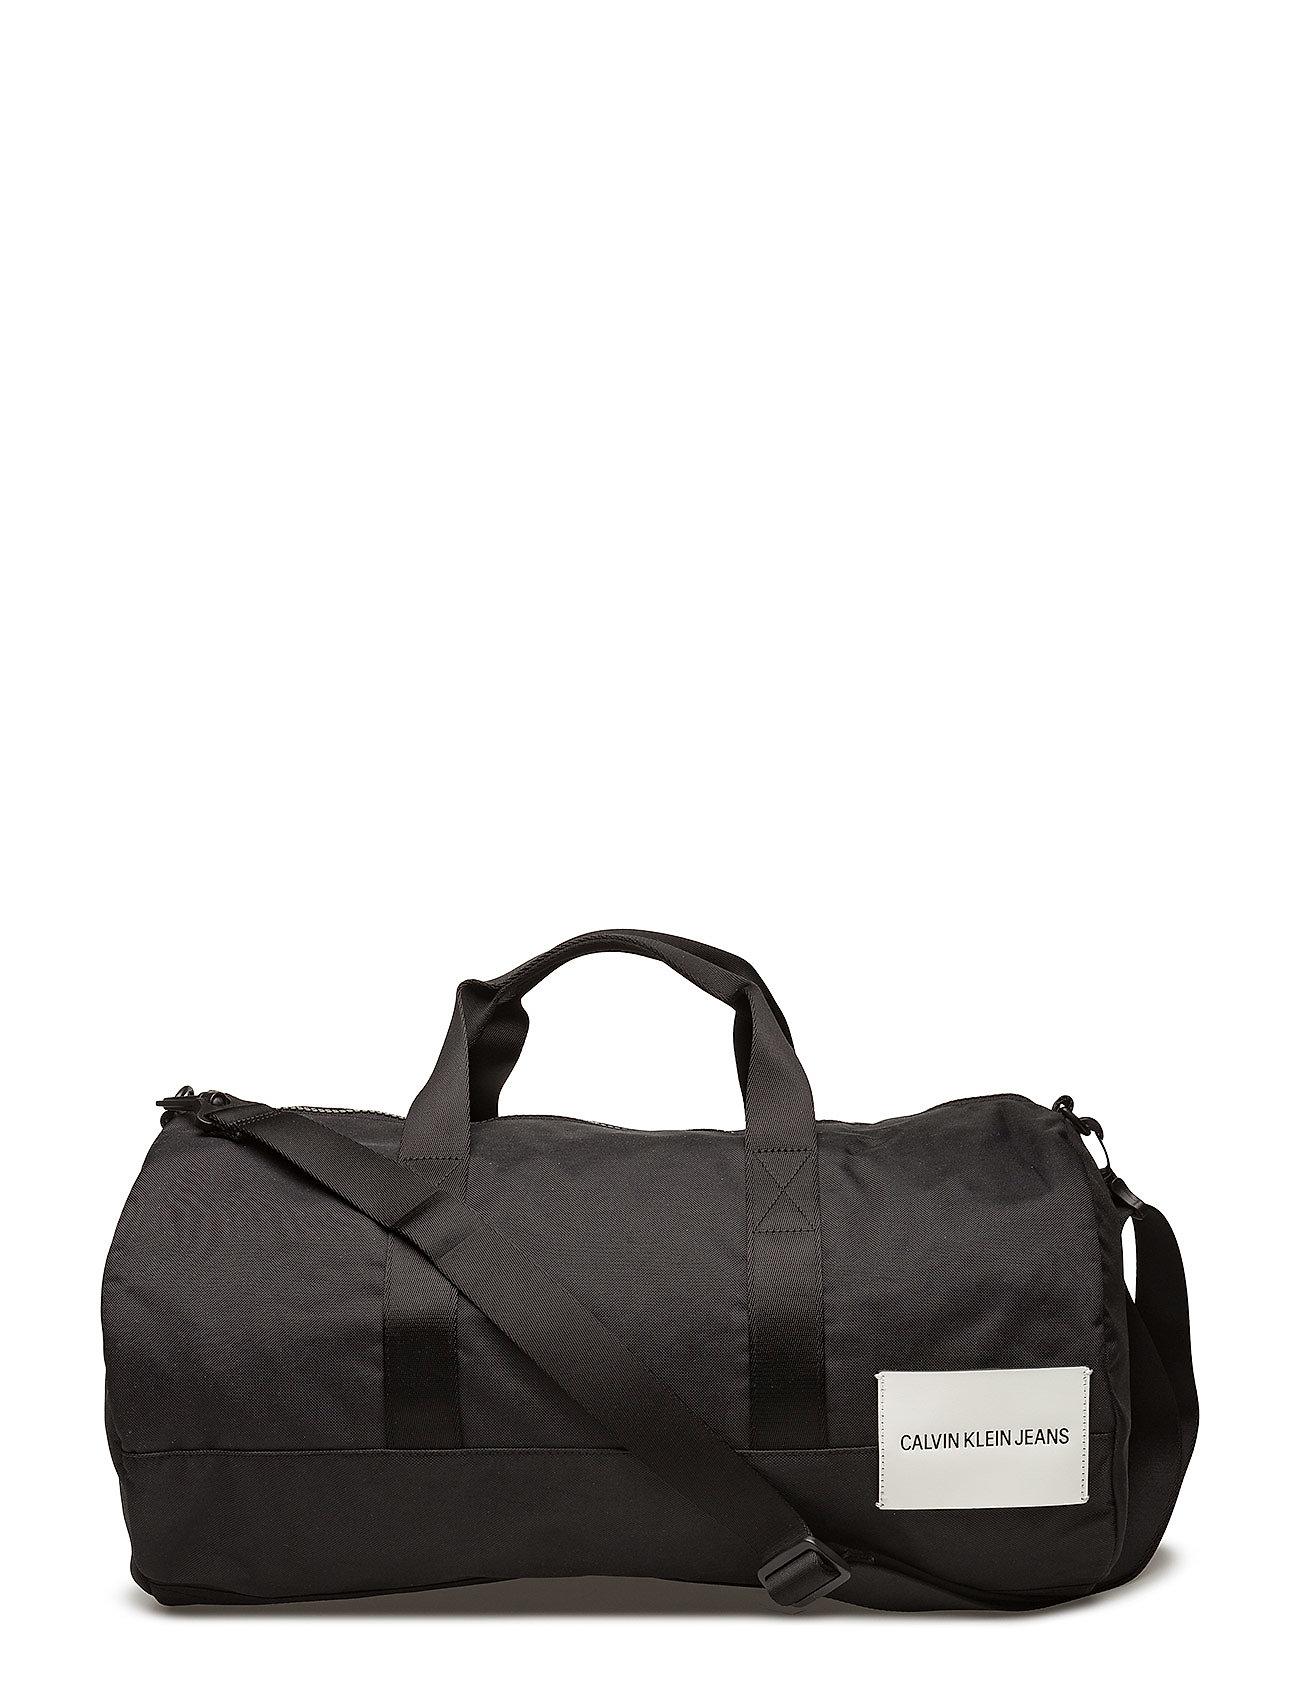 sport essential duffle 53 black 900 kr calvin klein. Black Bedroom Furniture Sets. Home Design Ideas